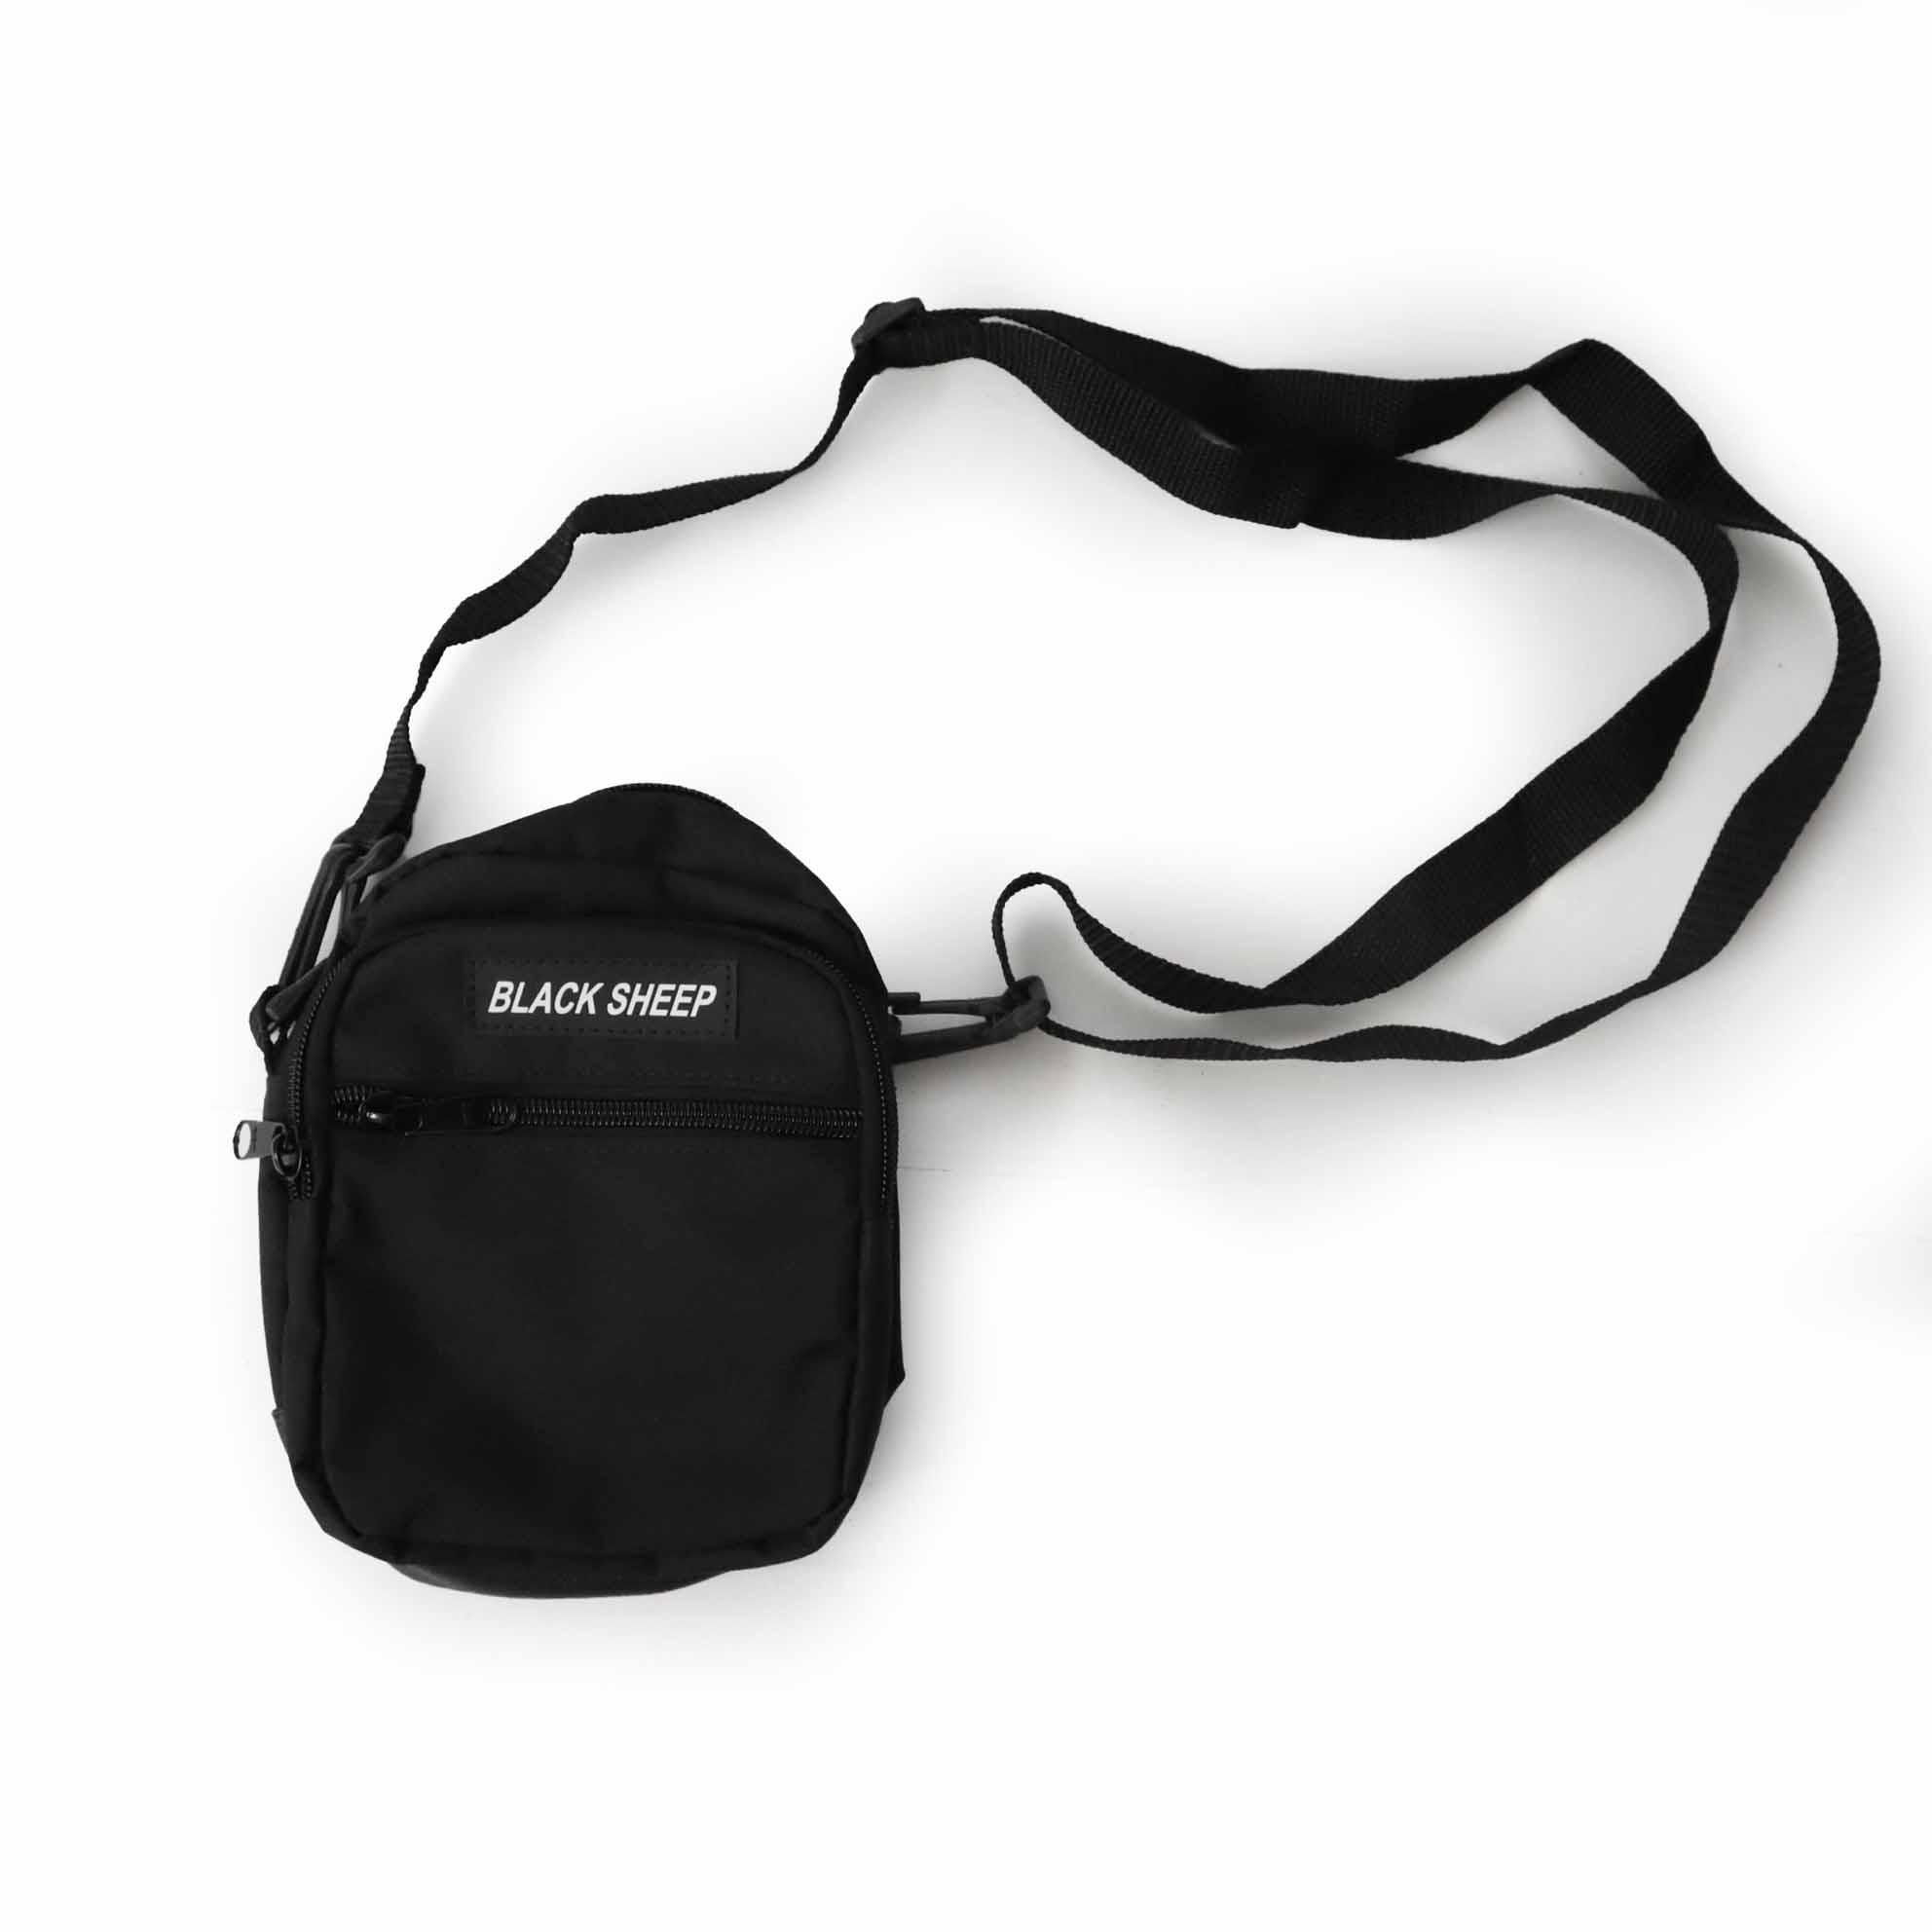 Shoulder Bag Black Sheep - Preto